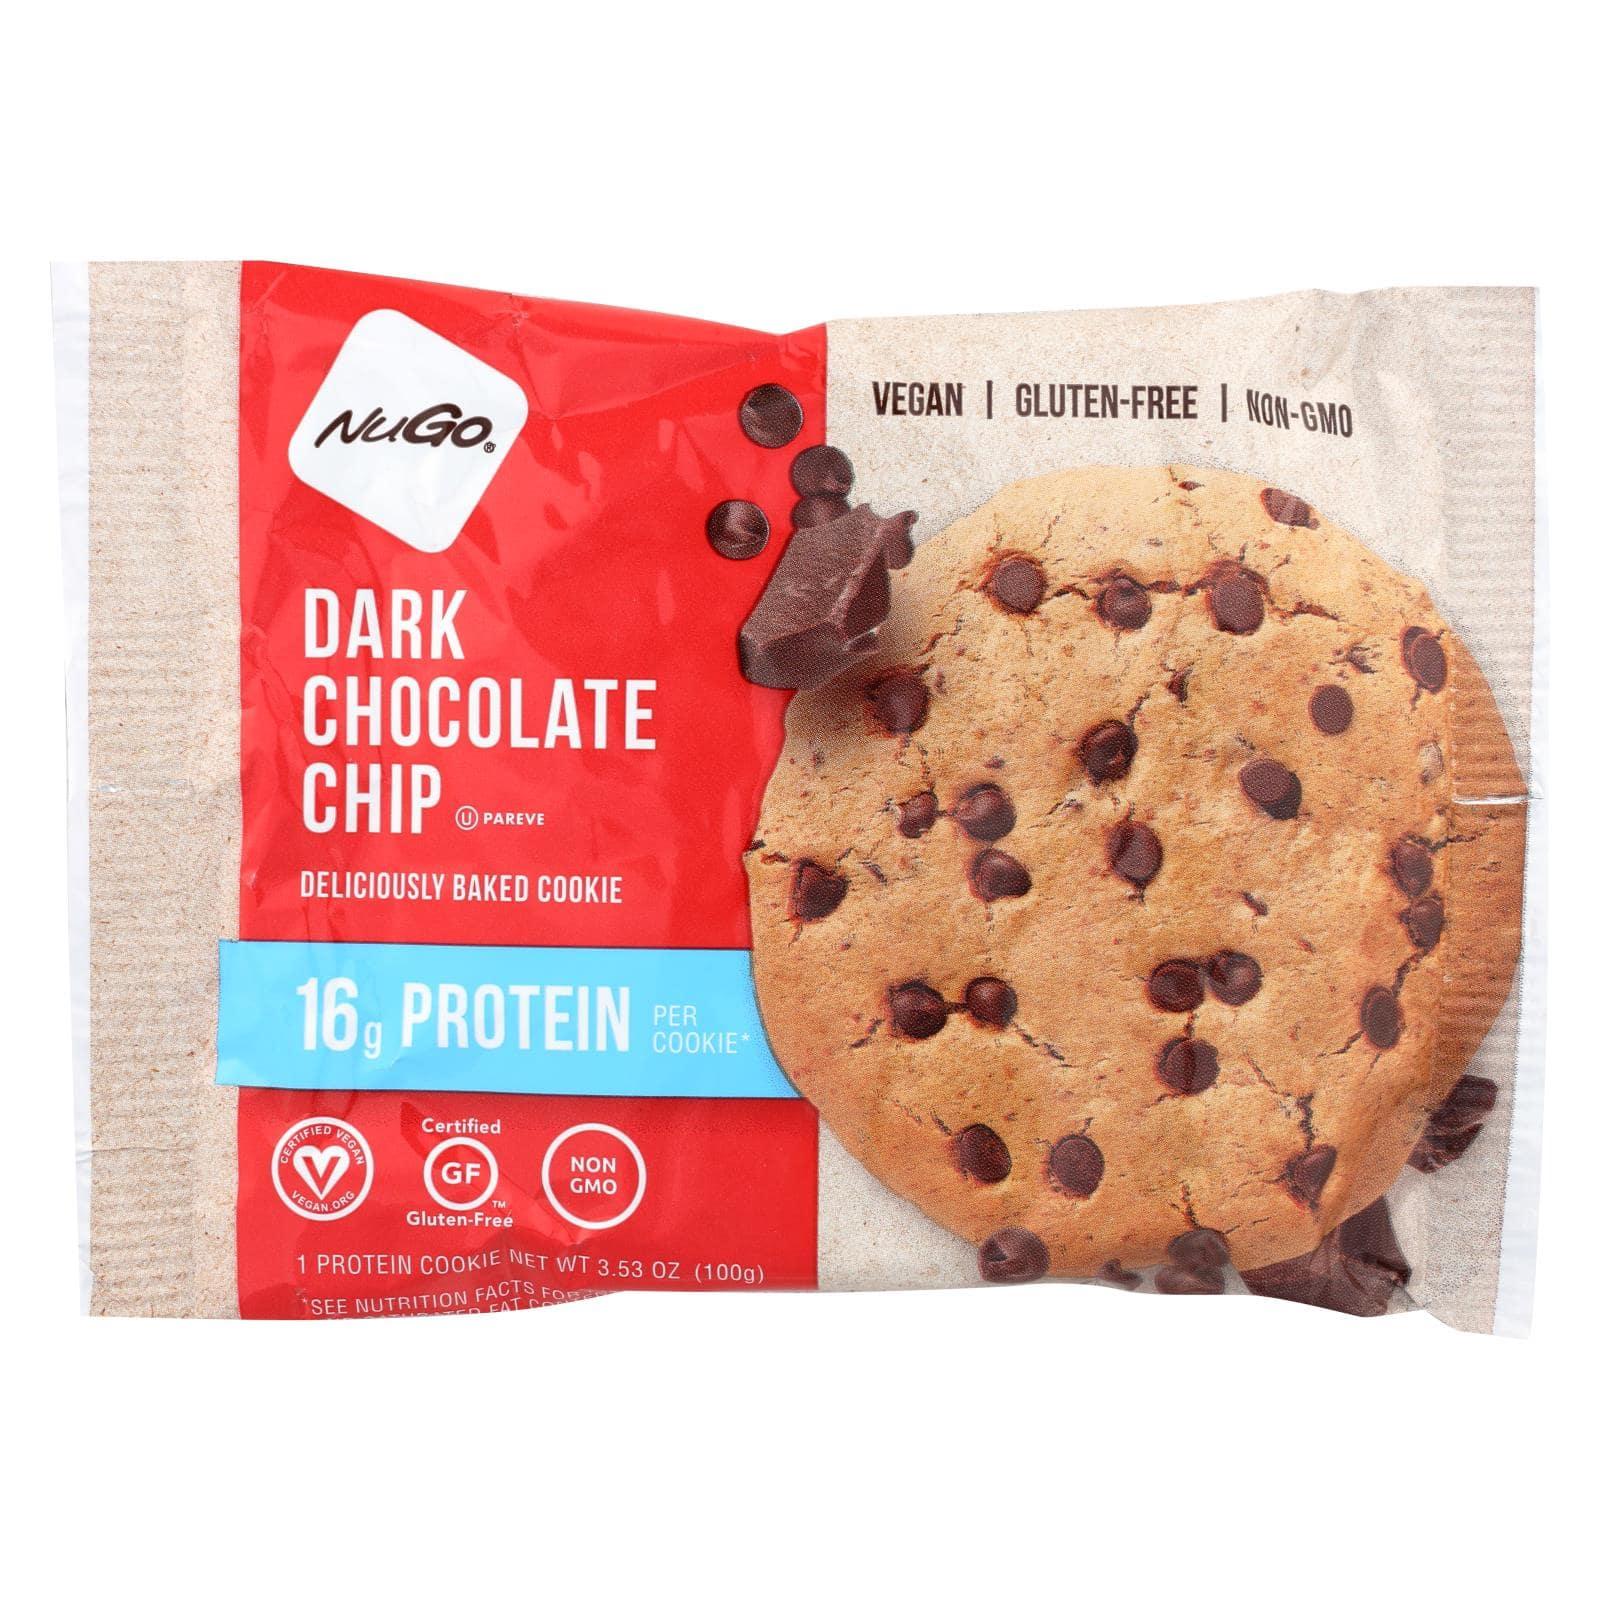 Nugo Protein Cookie